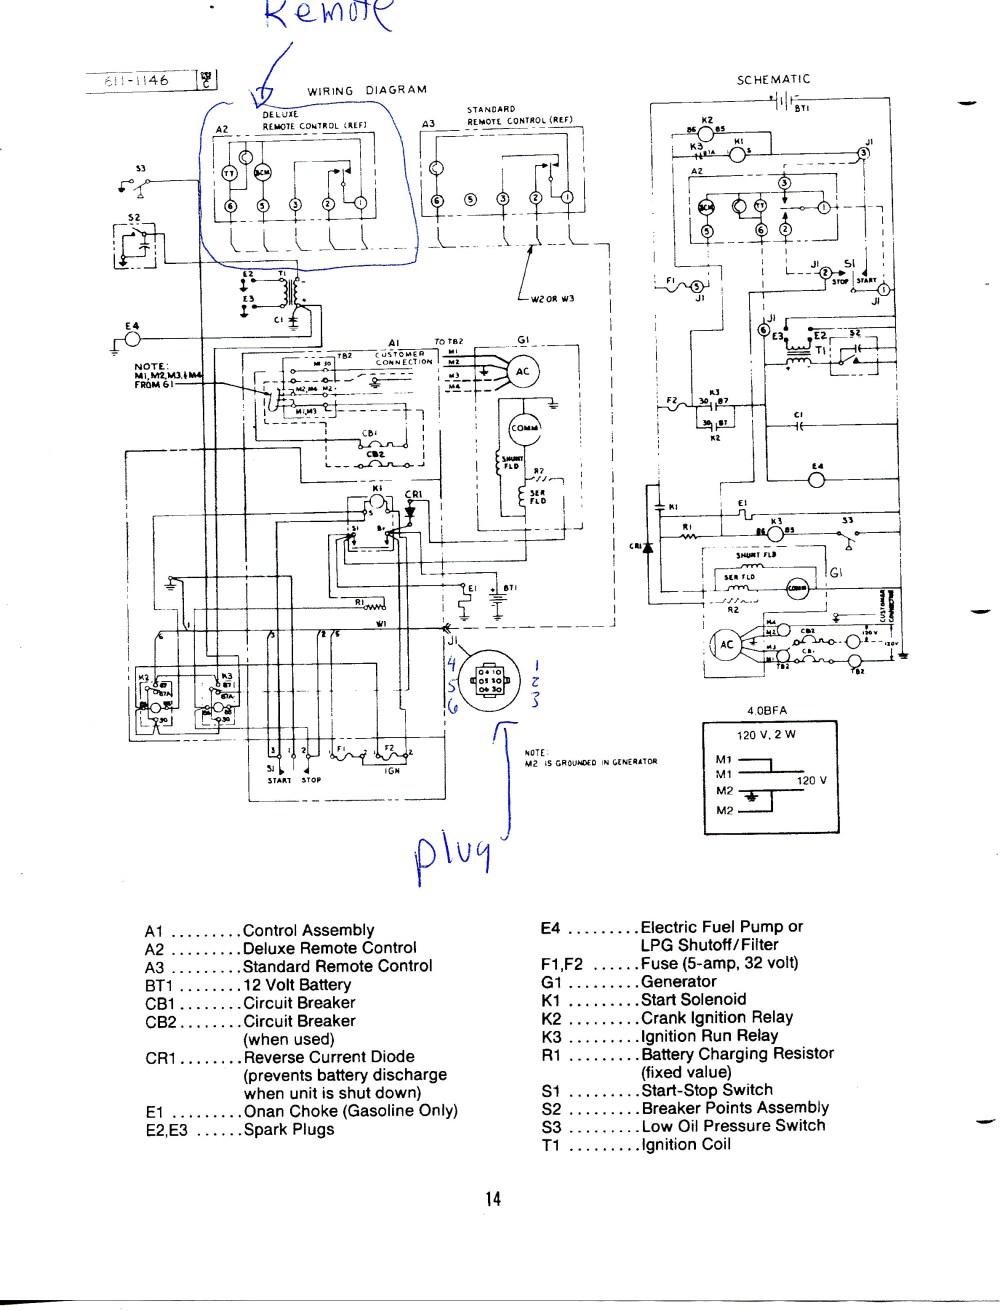 medium resolution of 110 schematic wiring backfeed diagram wiring diagrams bright mix 110v schematic wiring diagram free download schematic